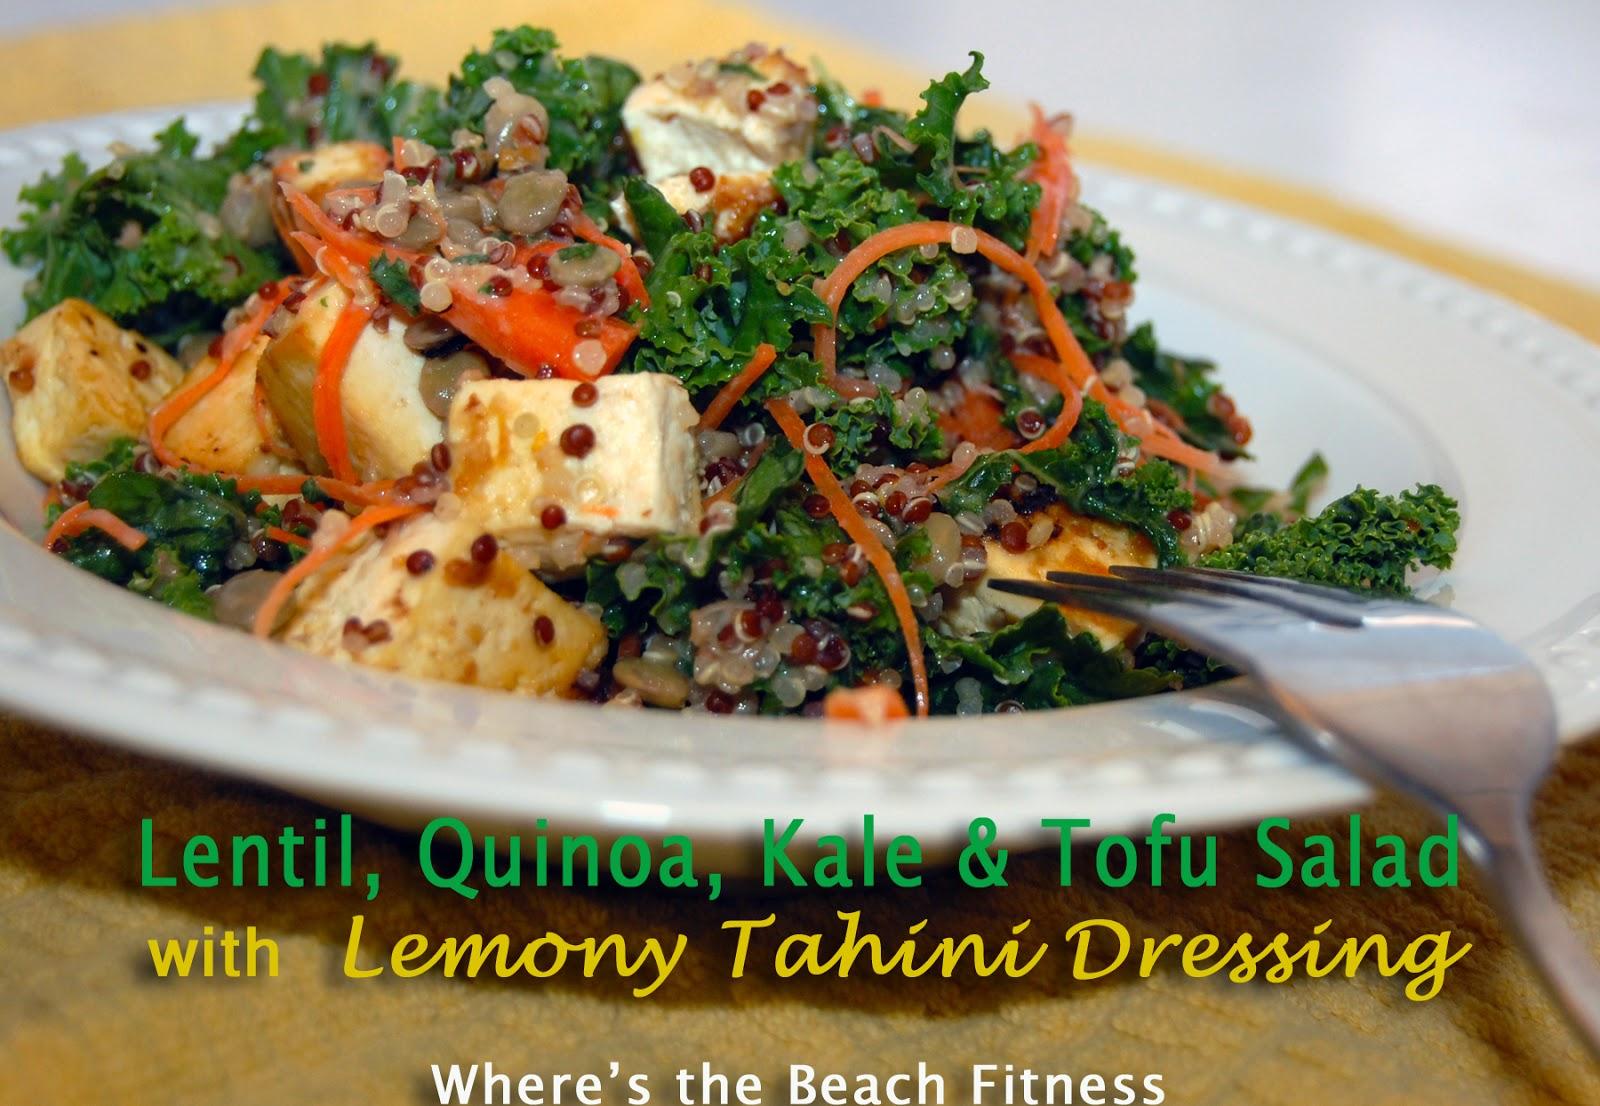 Where's the Beach?: Lentil, Quinoa, Kale & Tofu Salad with Lemony ...